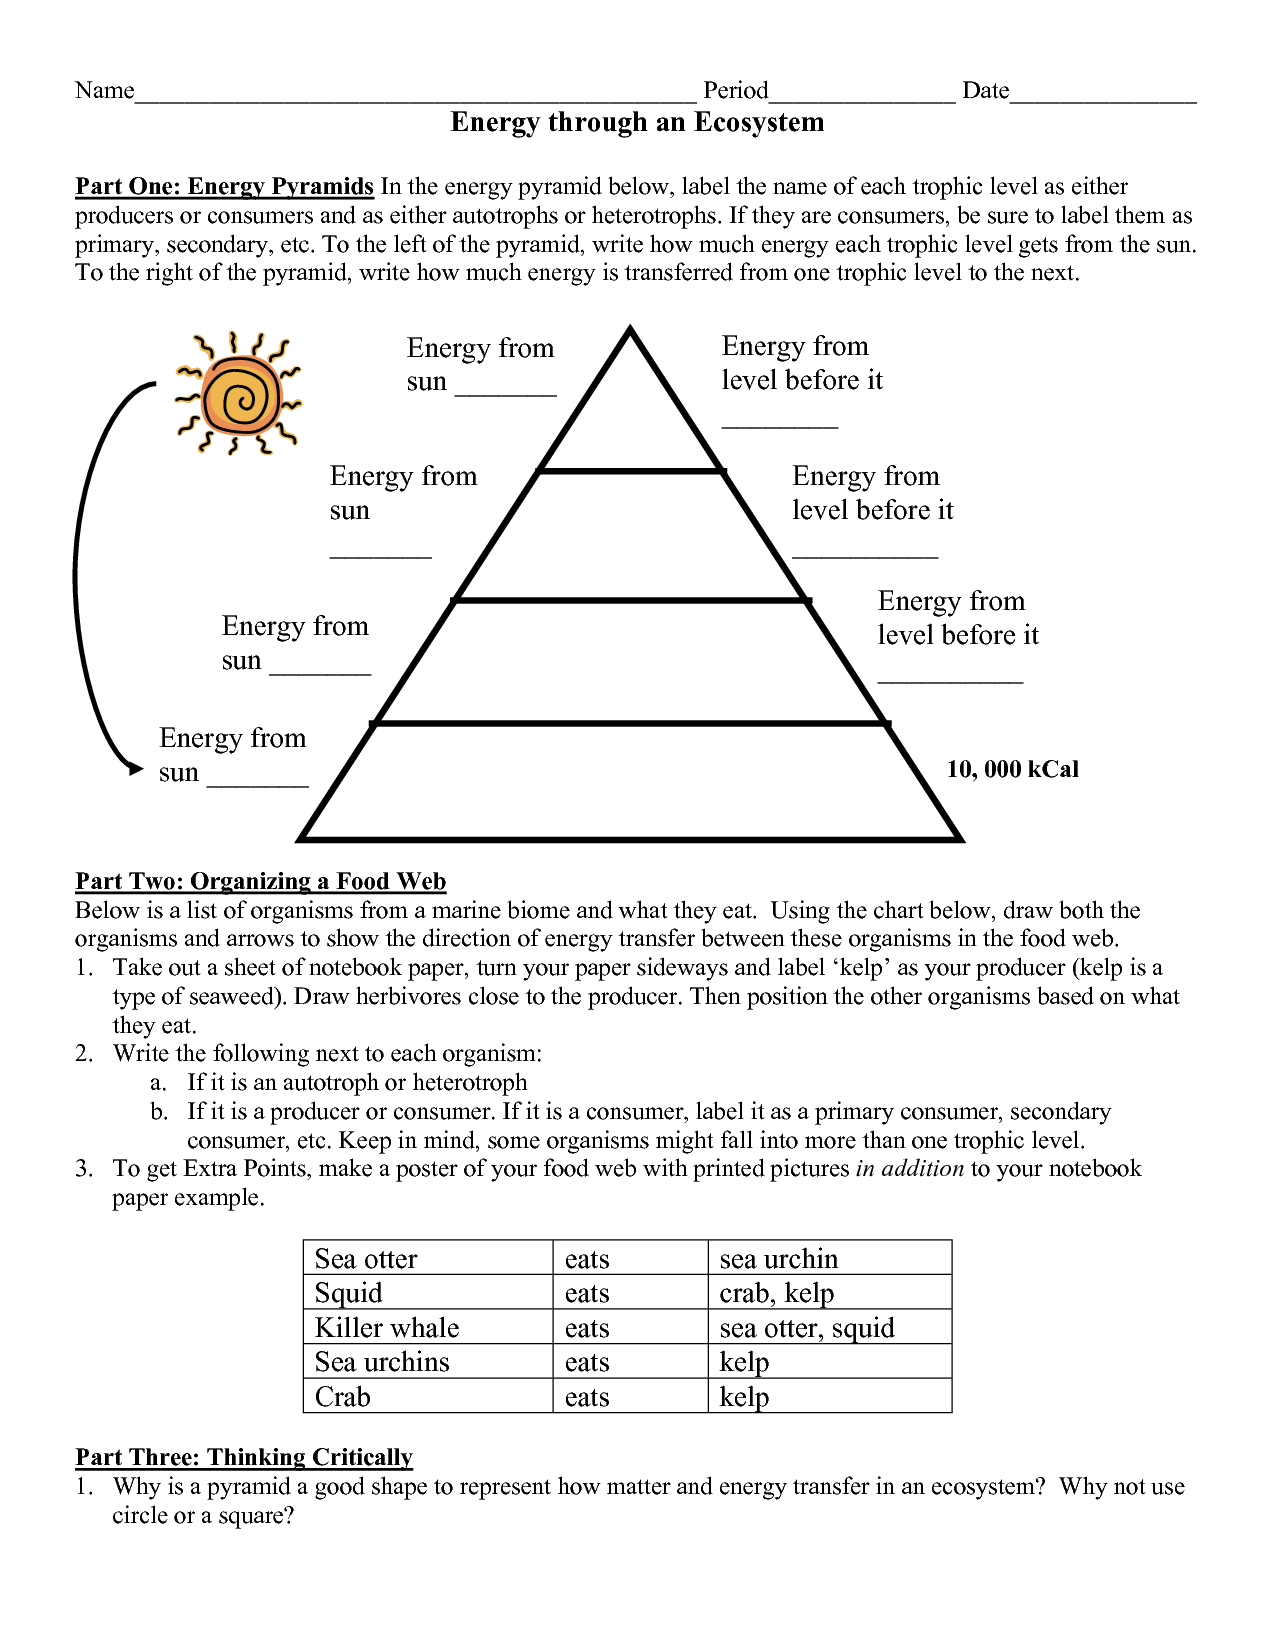 Worksheet Energy Pyramid 1251184